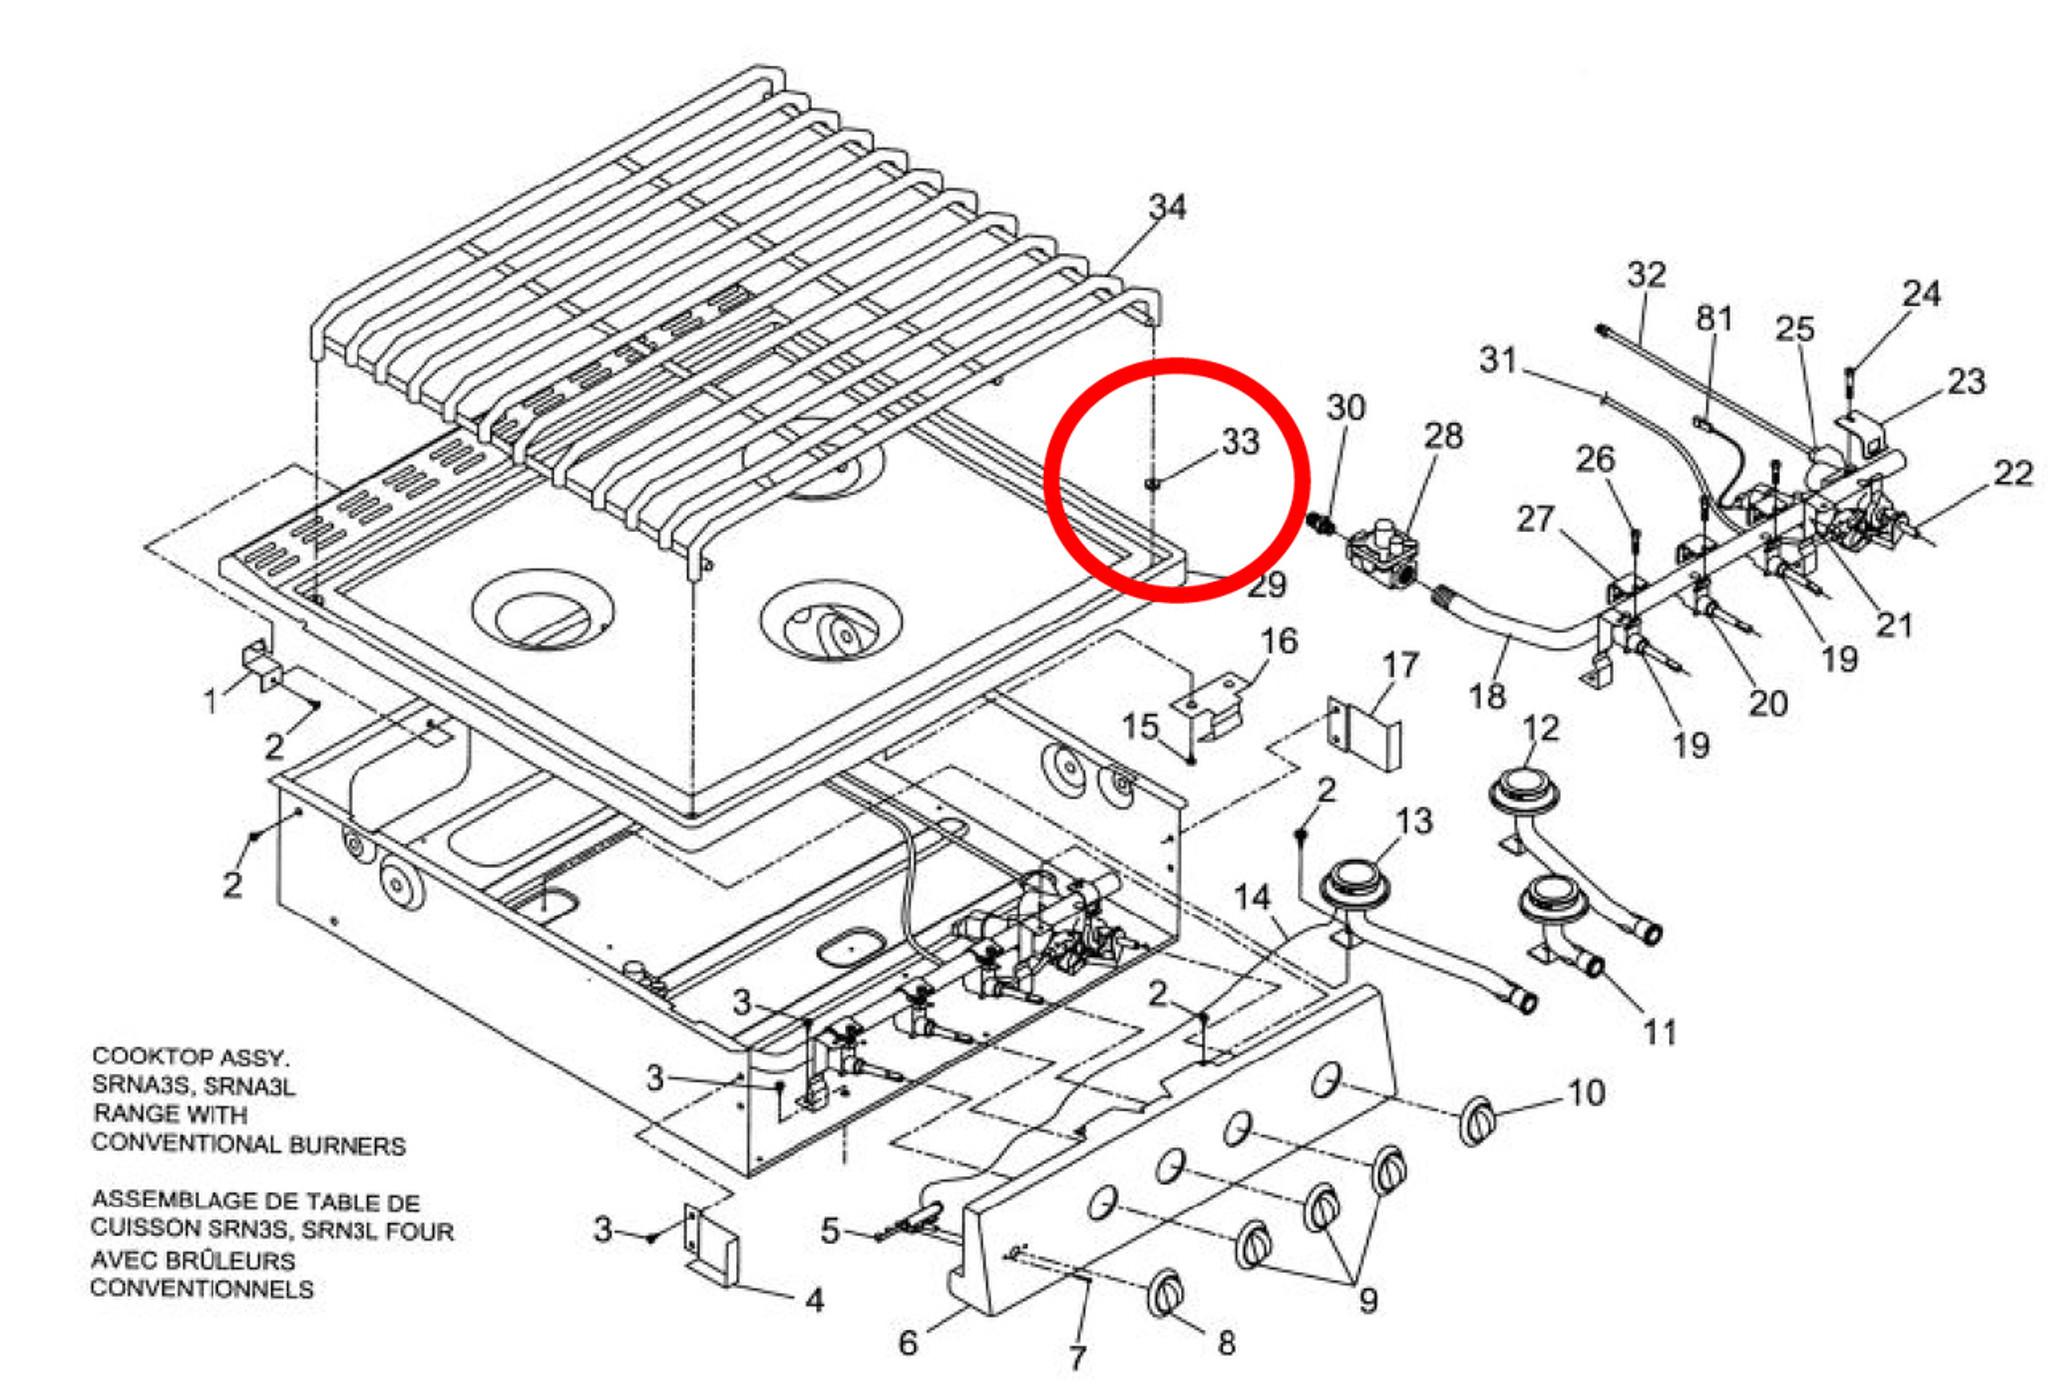 Rv Stove Diagram - Wiring Diagrams Word on